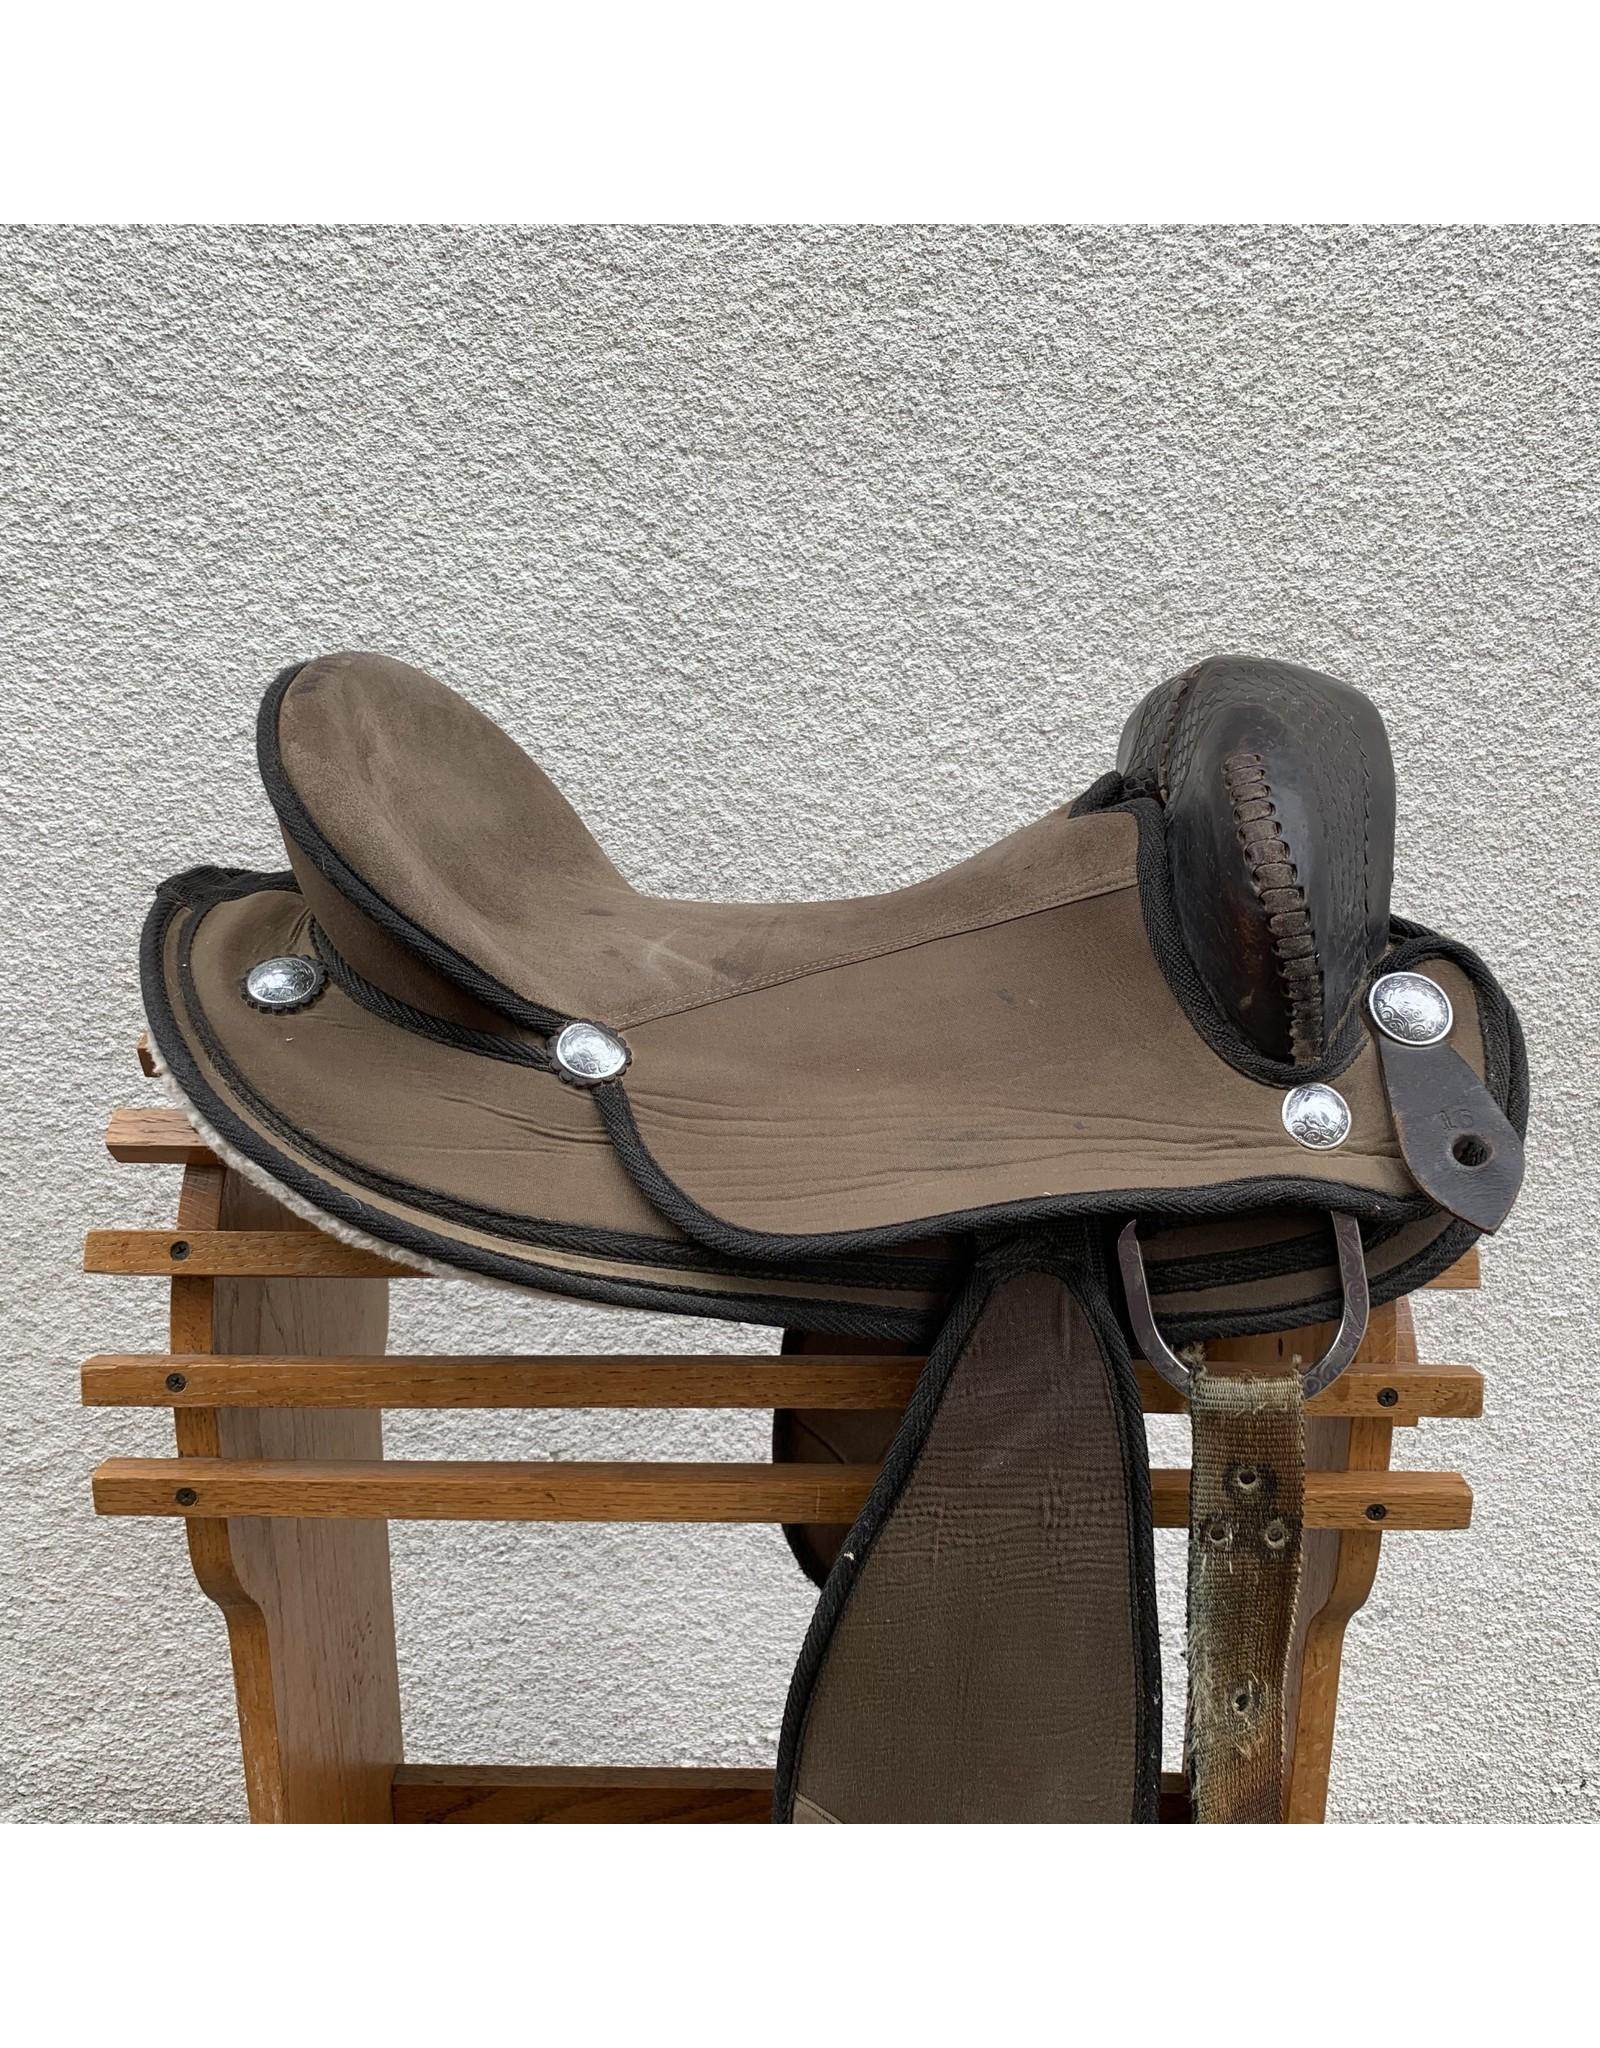 "Synthetic Endurance Saddle by Bridle Pro Brazil 16"" Full Quarter Horse Bars"